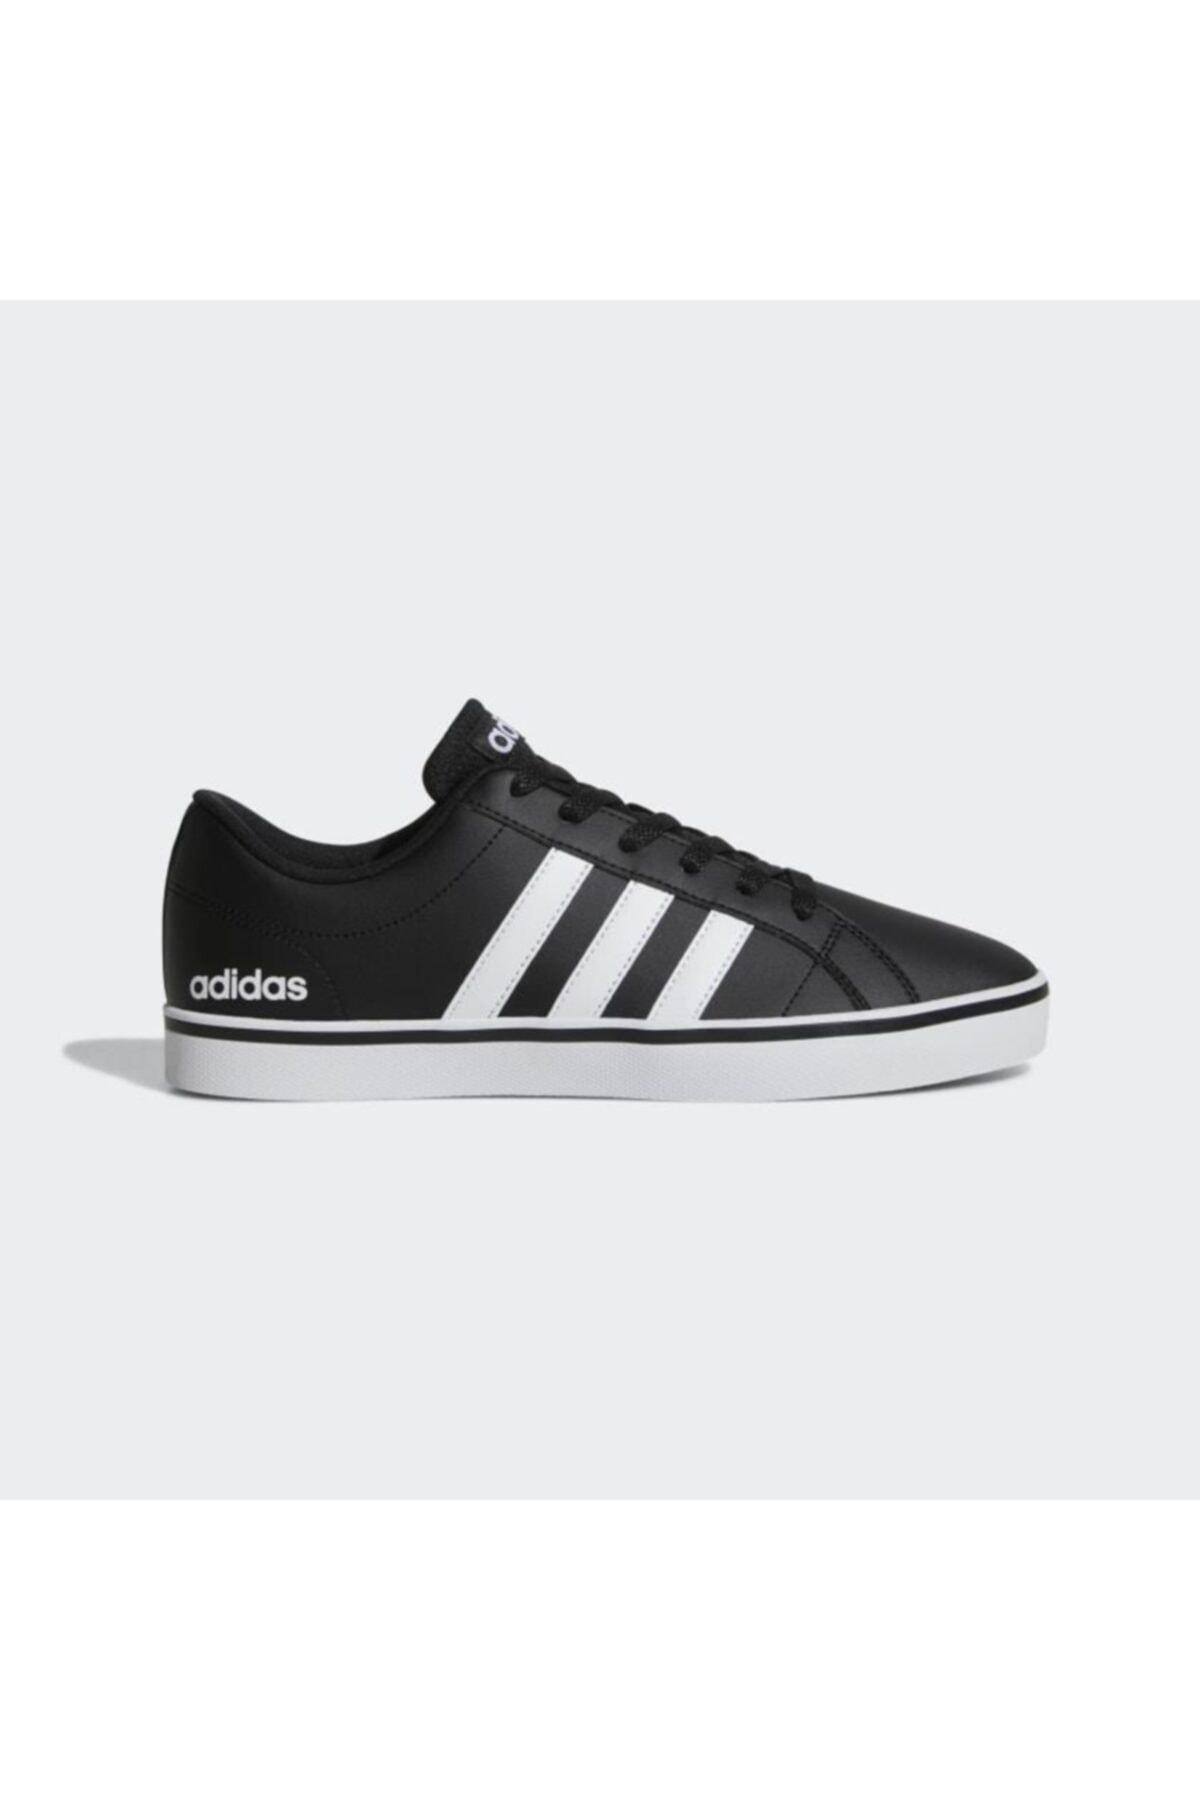 adidas Erkek Siyah Spor Ayakkabı  VS PACE 1